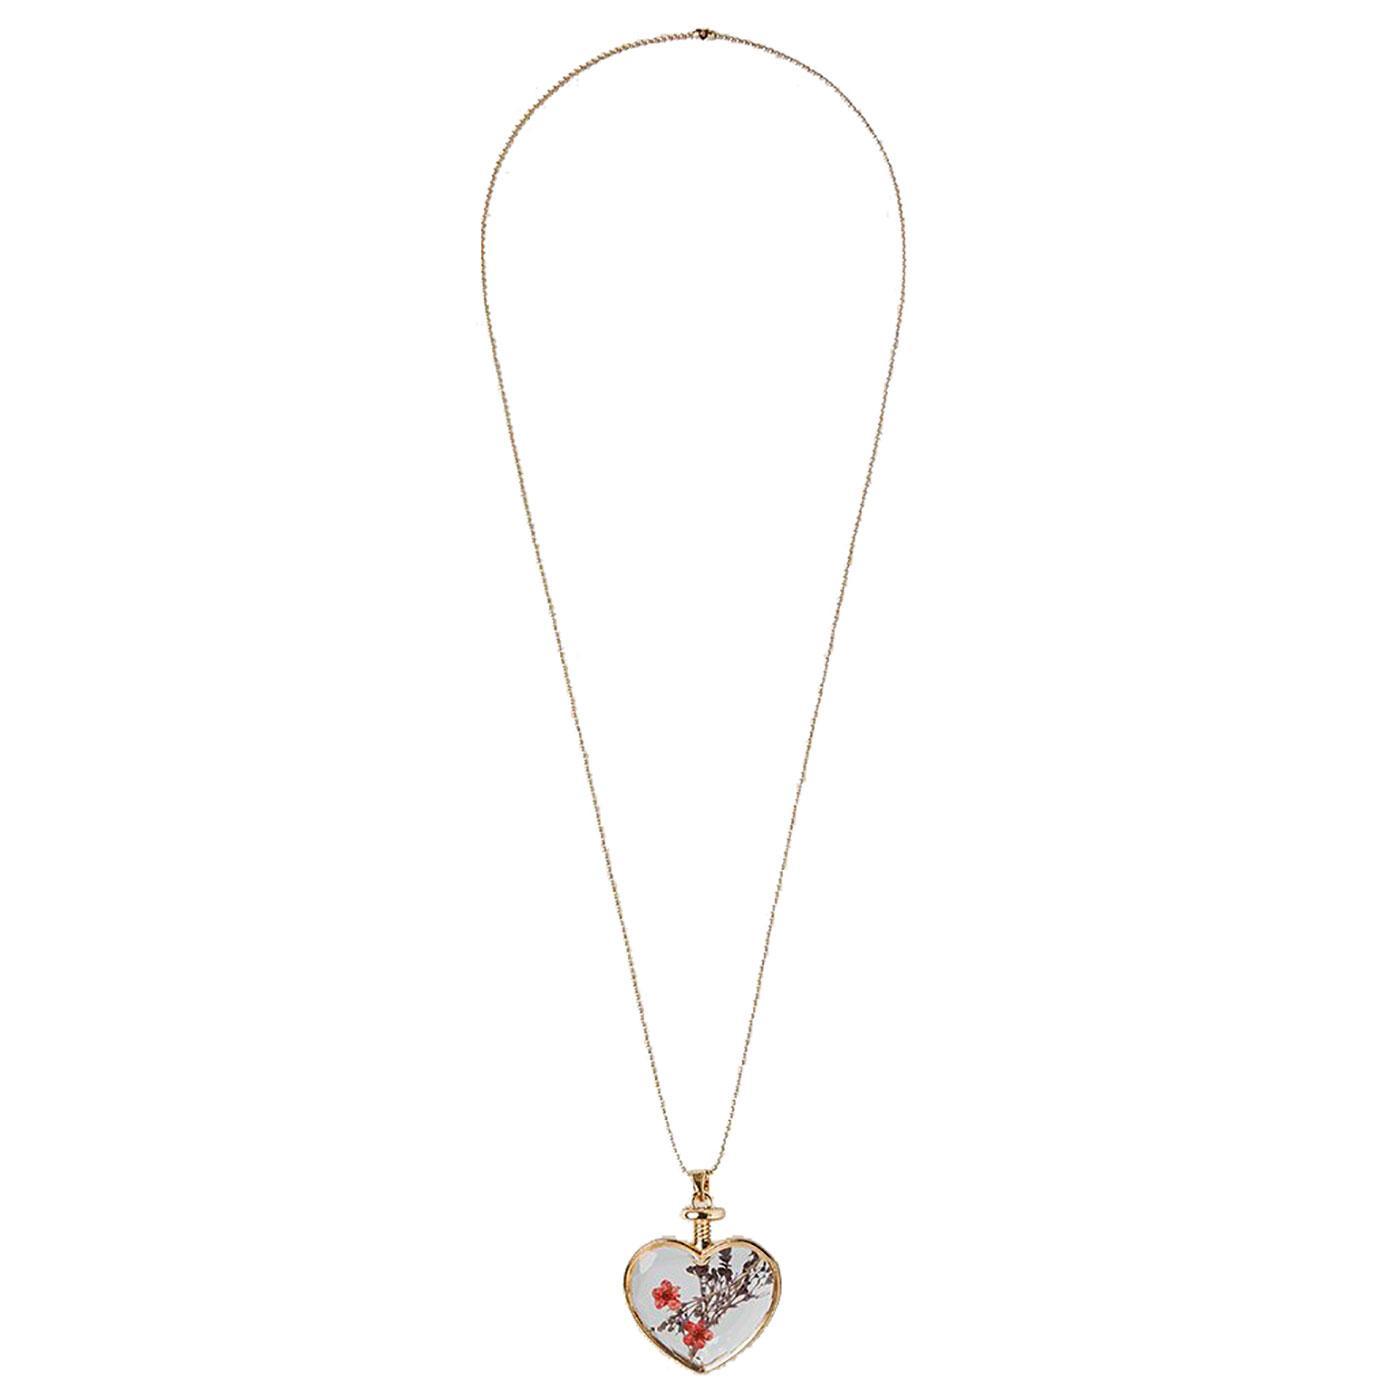 Adina LOUCHE Vintage Pressed Flower Necklace P